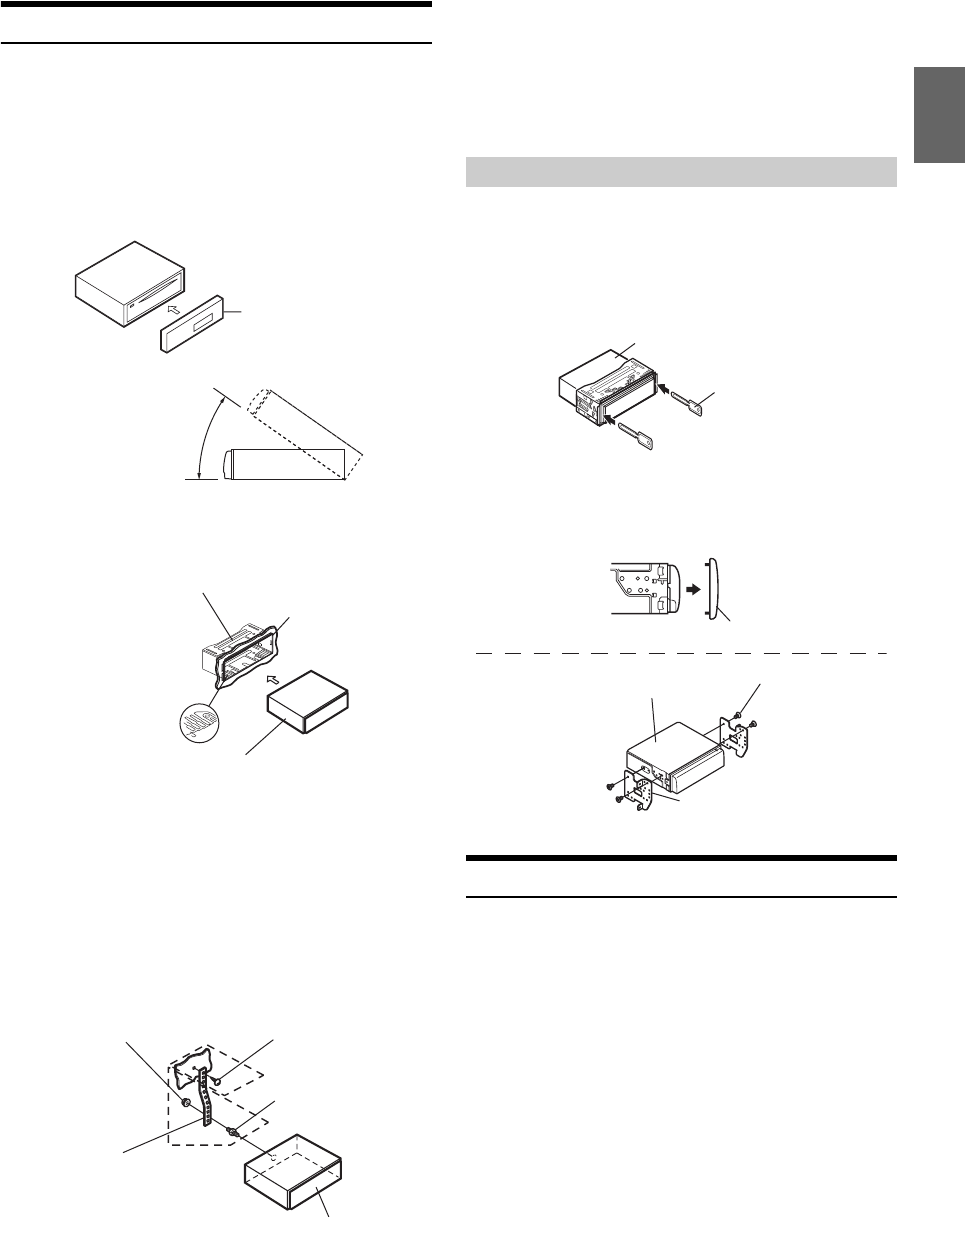 medium resolution of alpine ute 42bt owners manual cde sxm145bt cde 143bt ute 43 en alpine sxm145bt car stereo wiring diagram